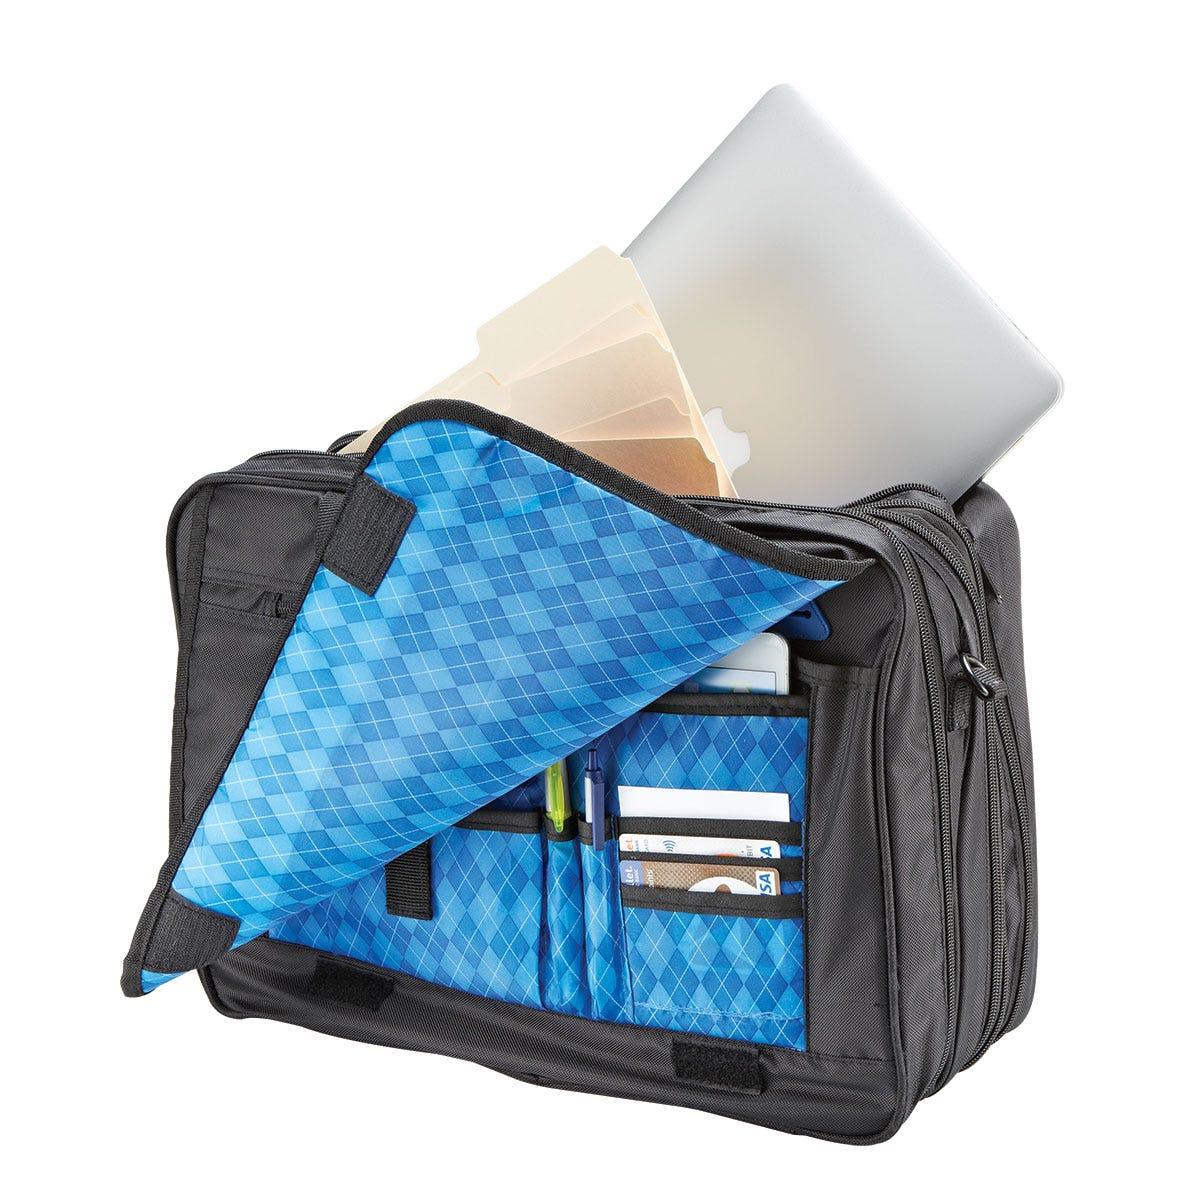 Hush Puppies Tas Pria Chuck Document Bag Coklat Daftar Harga Backpack Wanita Hawaii Biru Sumber Gambar